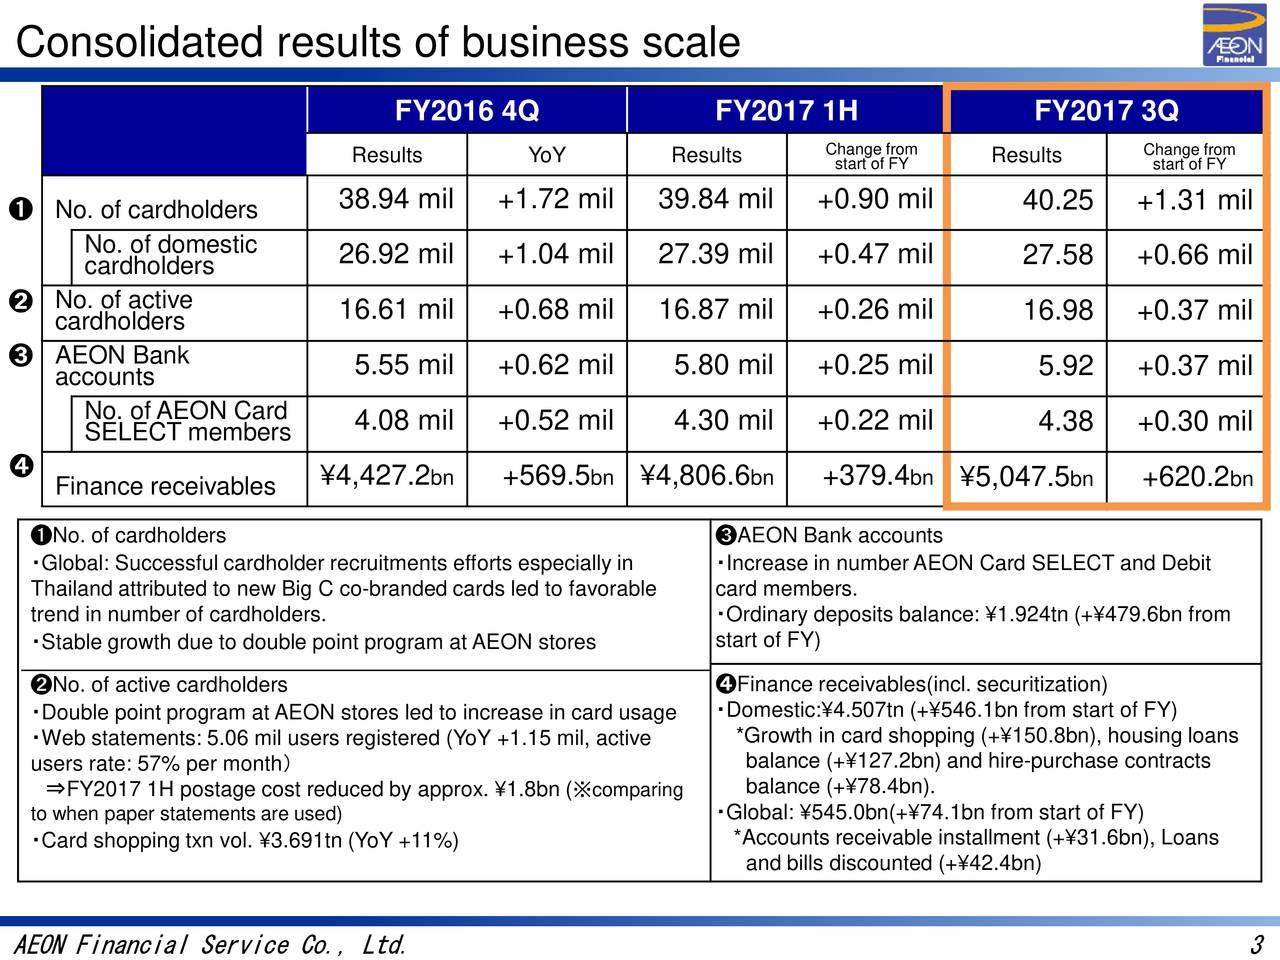 Aeon Financial Services Co , Ltd  2017 Q3 - Results